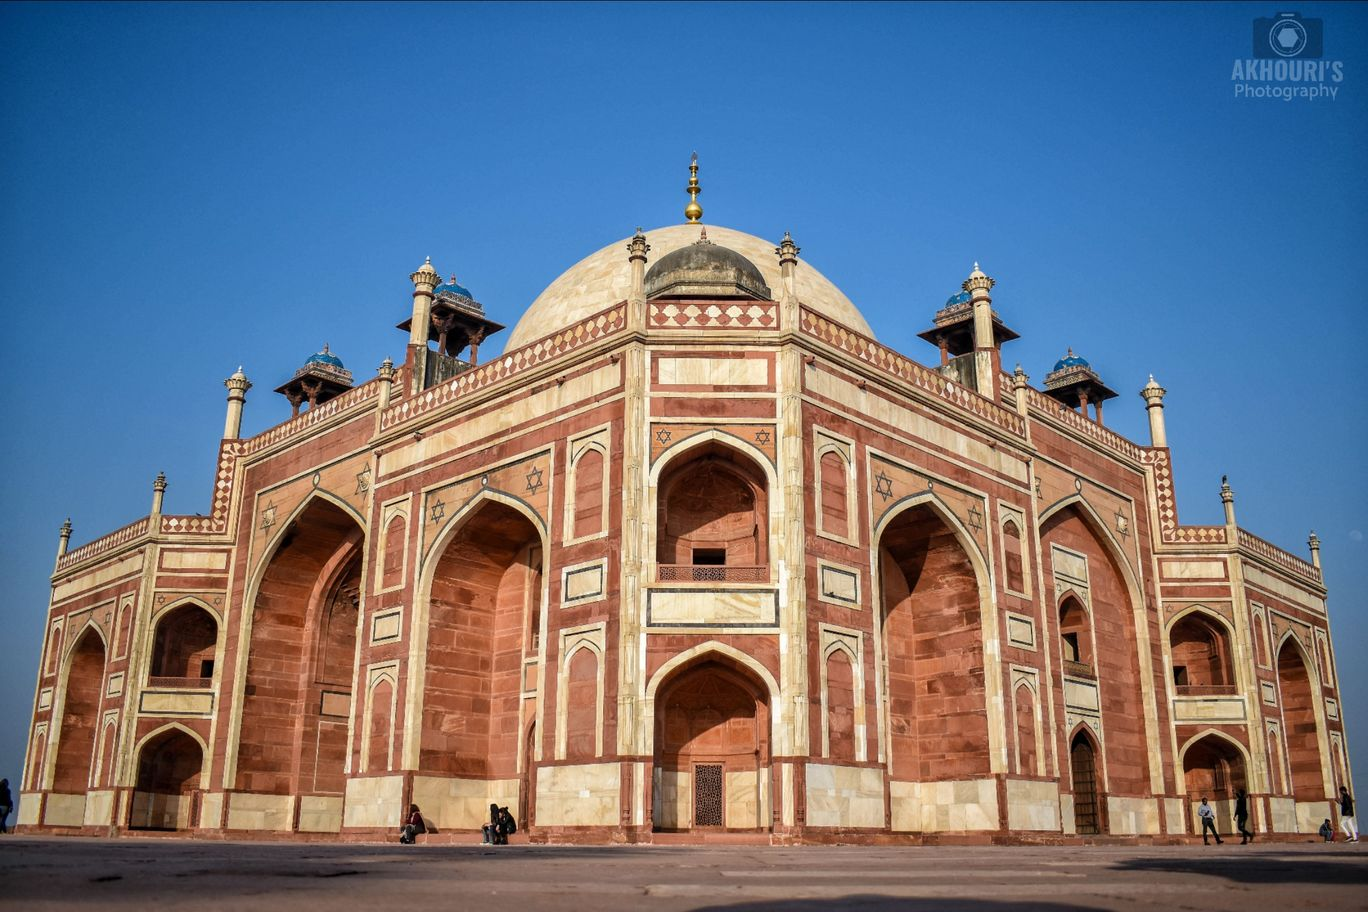 Photo of Humayun's Tomb By Saurav Akhouri